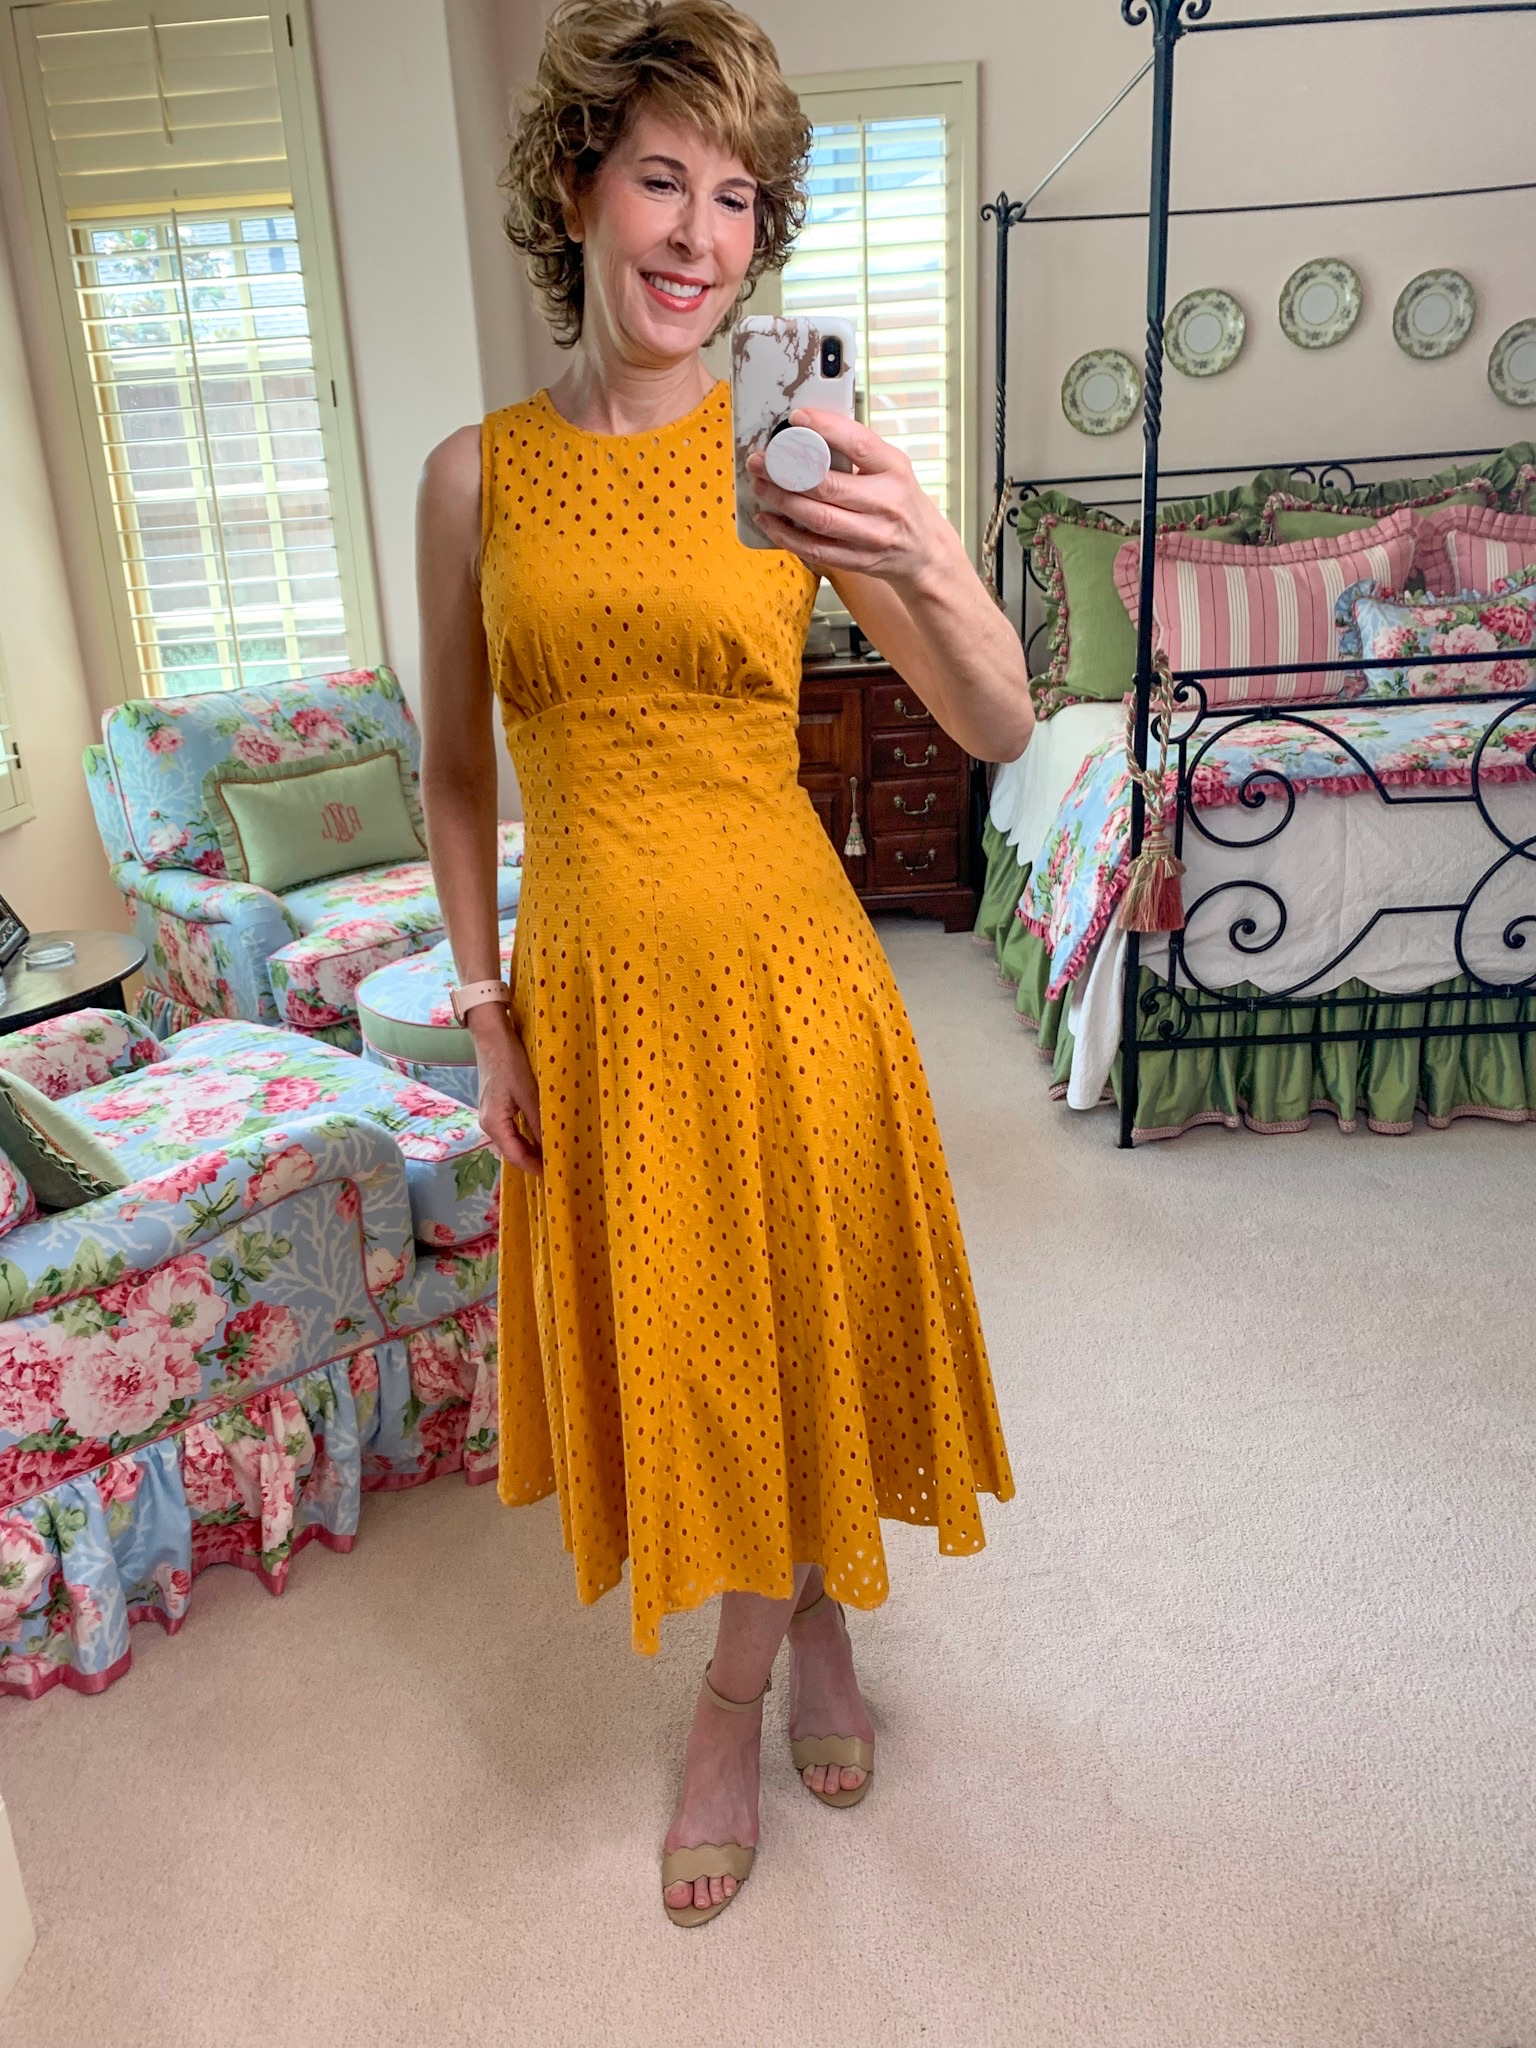 mirror selfie of woman in gold eyelet dress